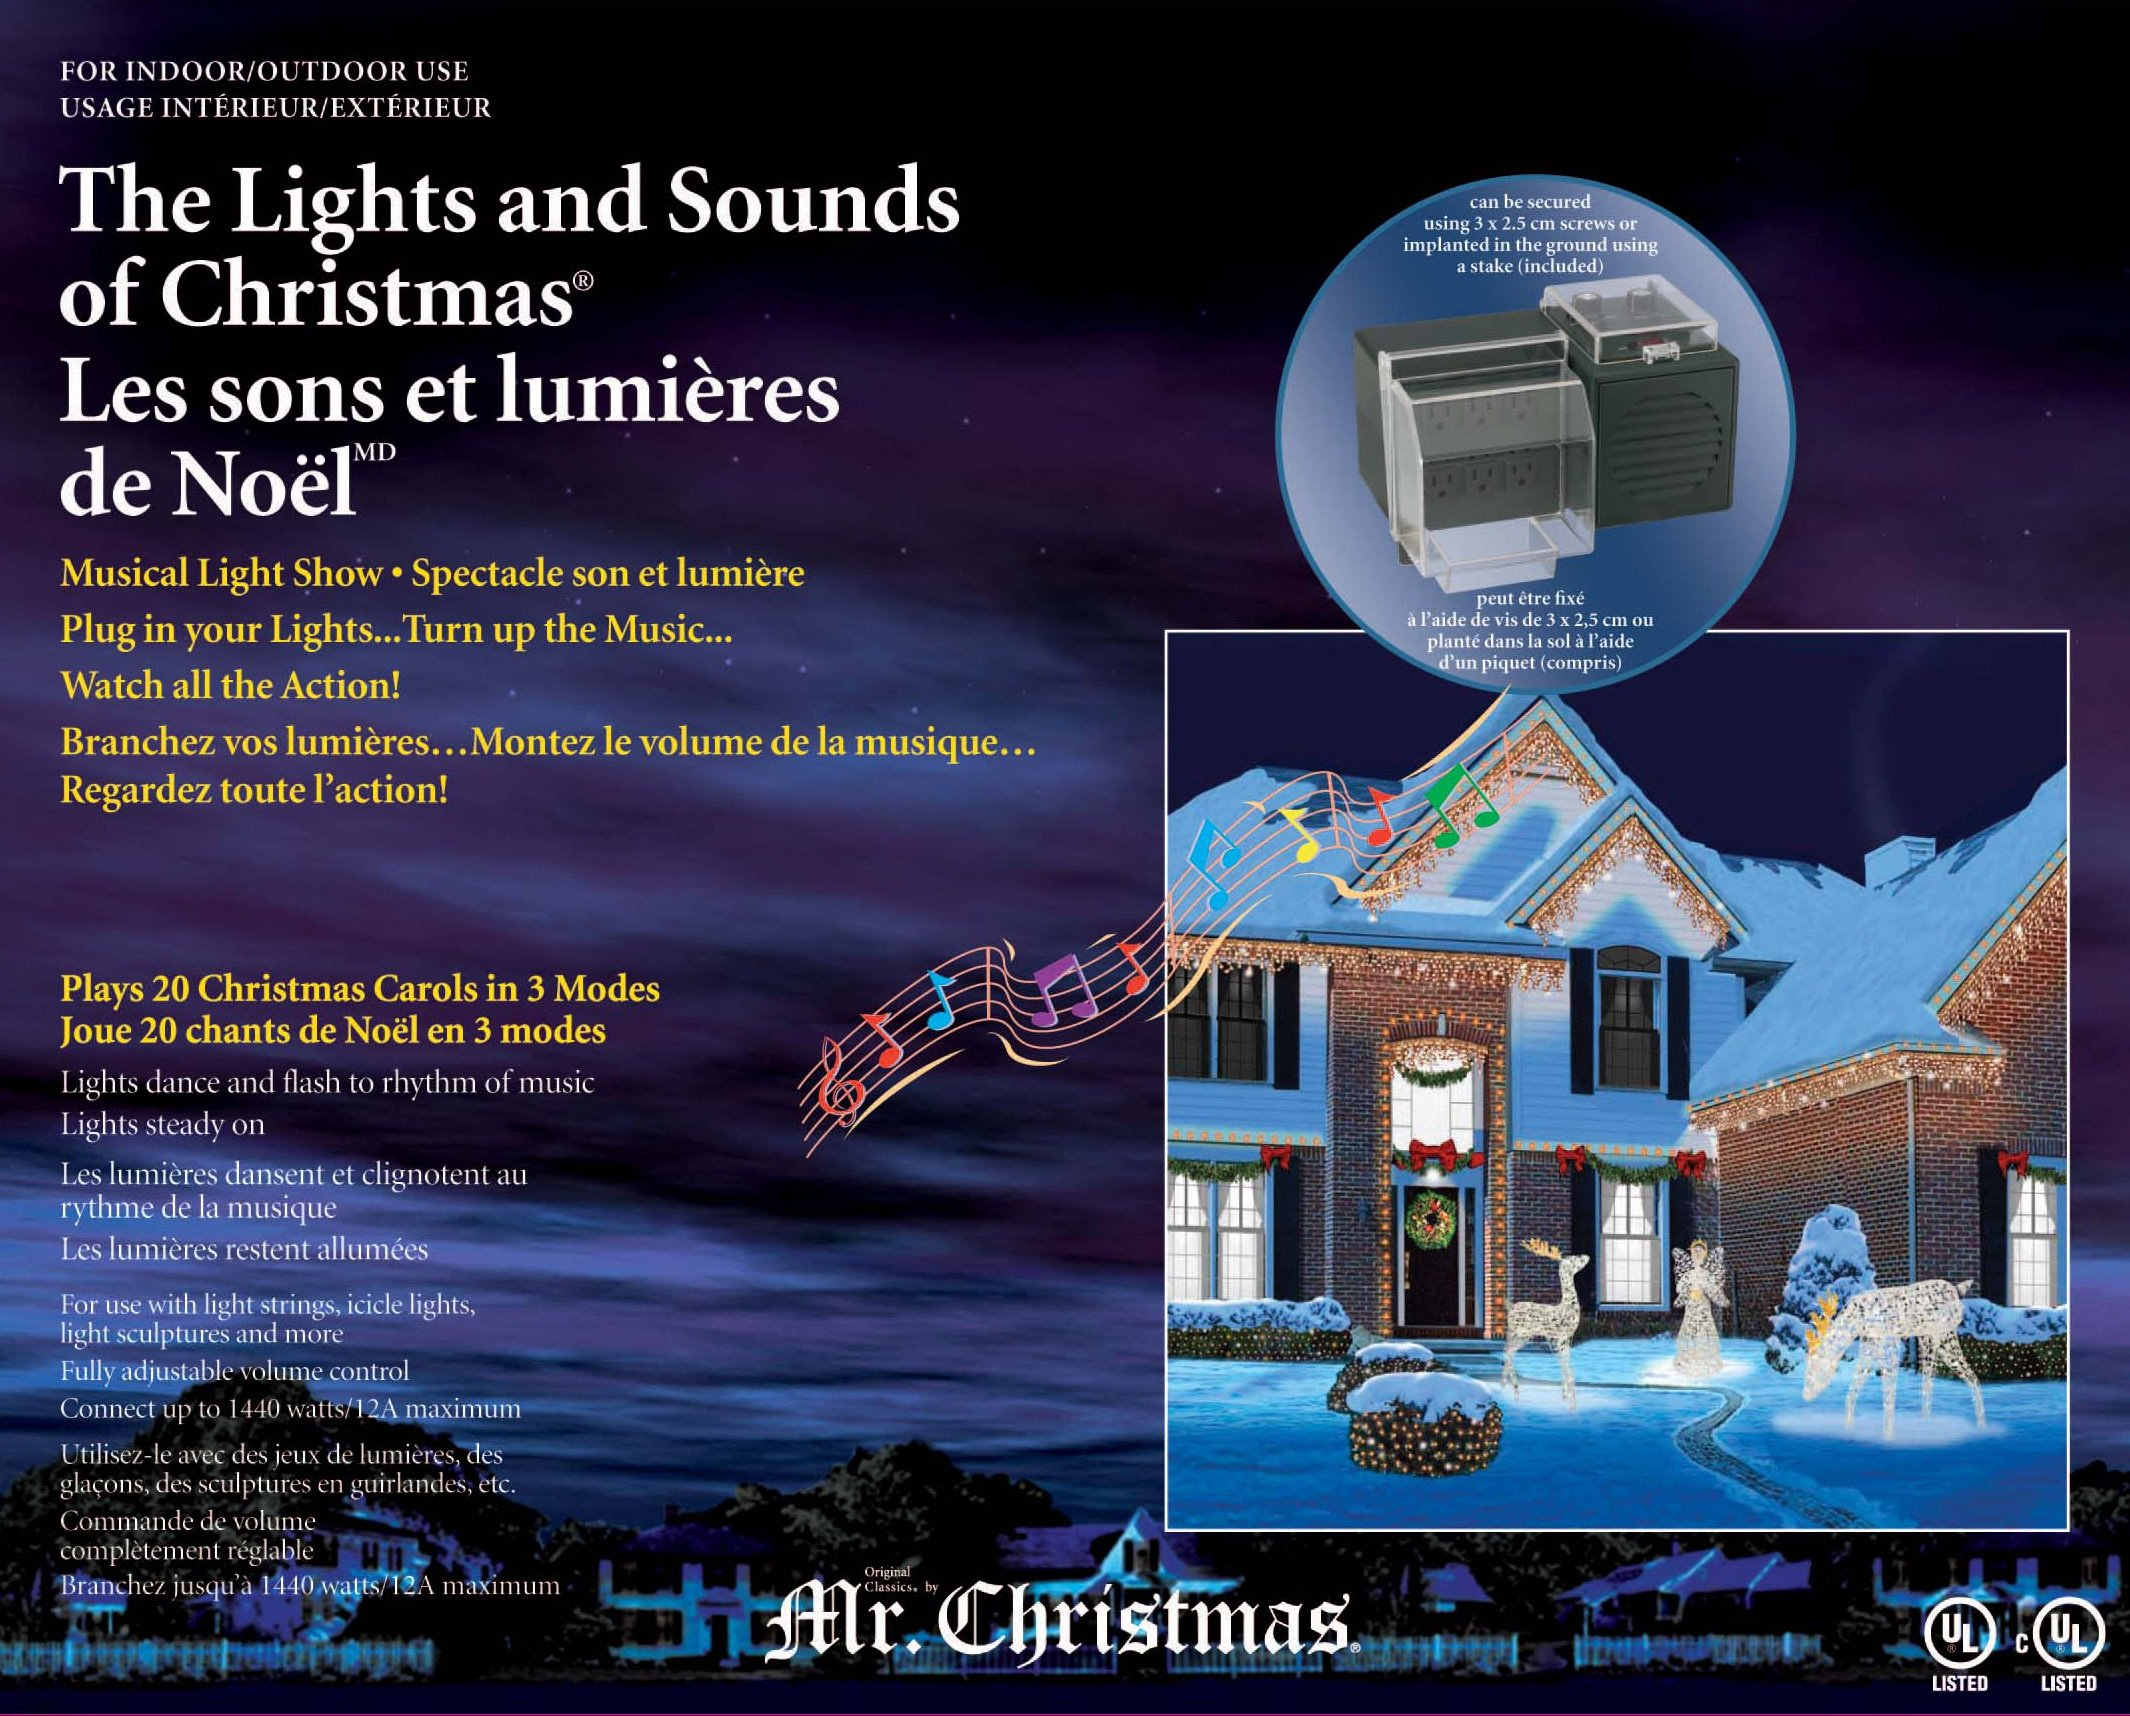 Mr. Christmas Lights and Sounds of Christmas, Outdoor by Mr. Christmas (Image #1)